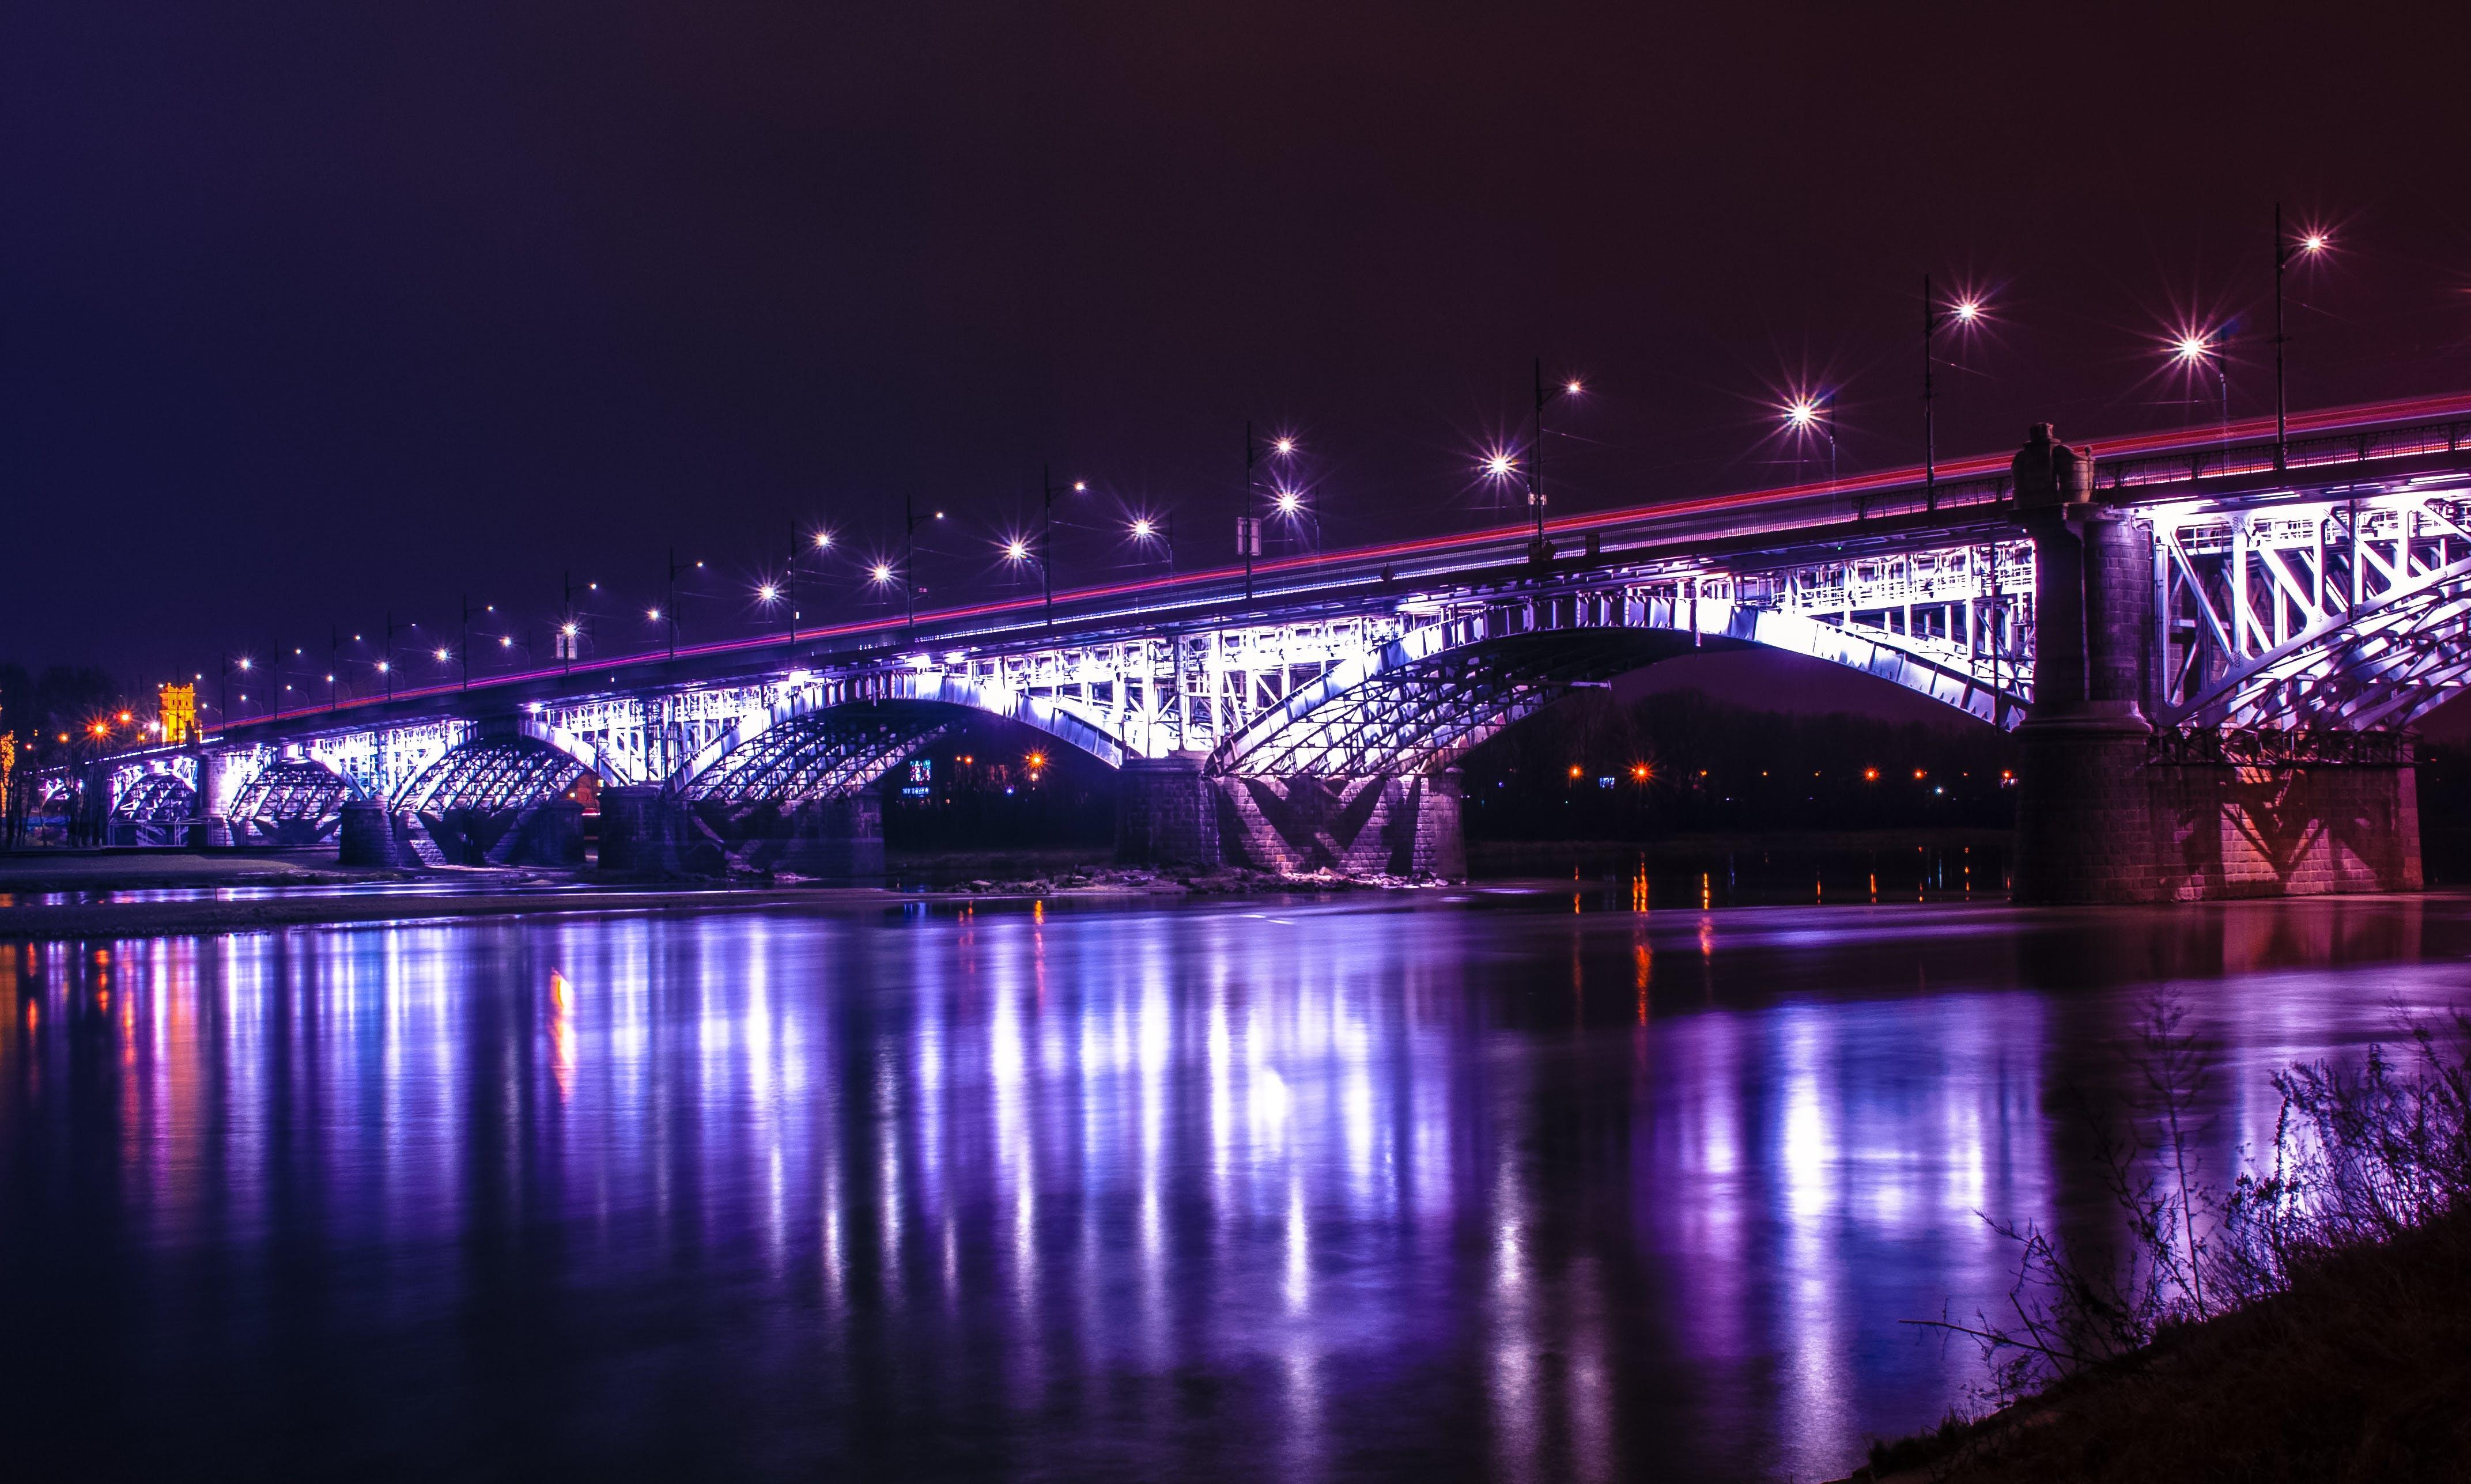 Architectural Photo of Bridge